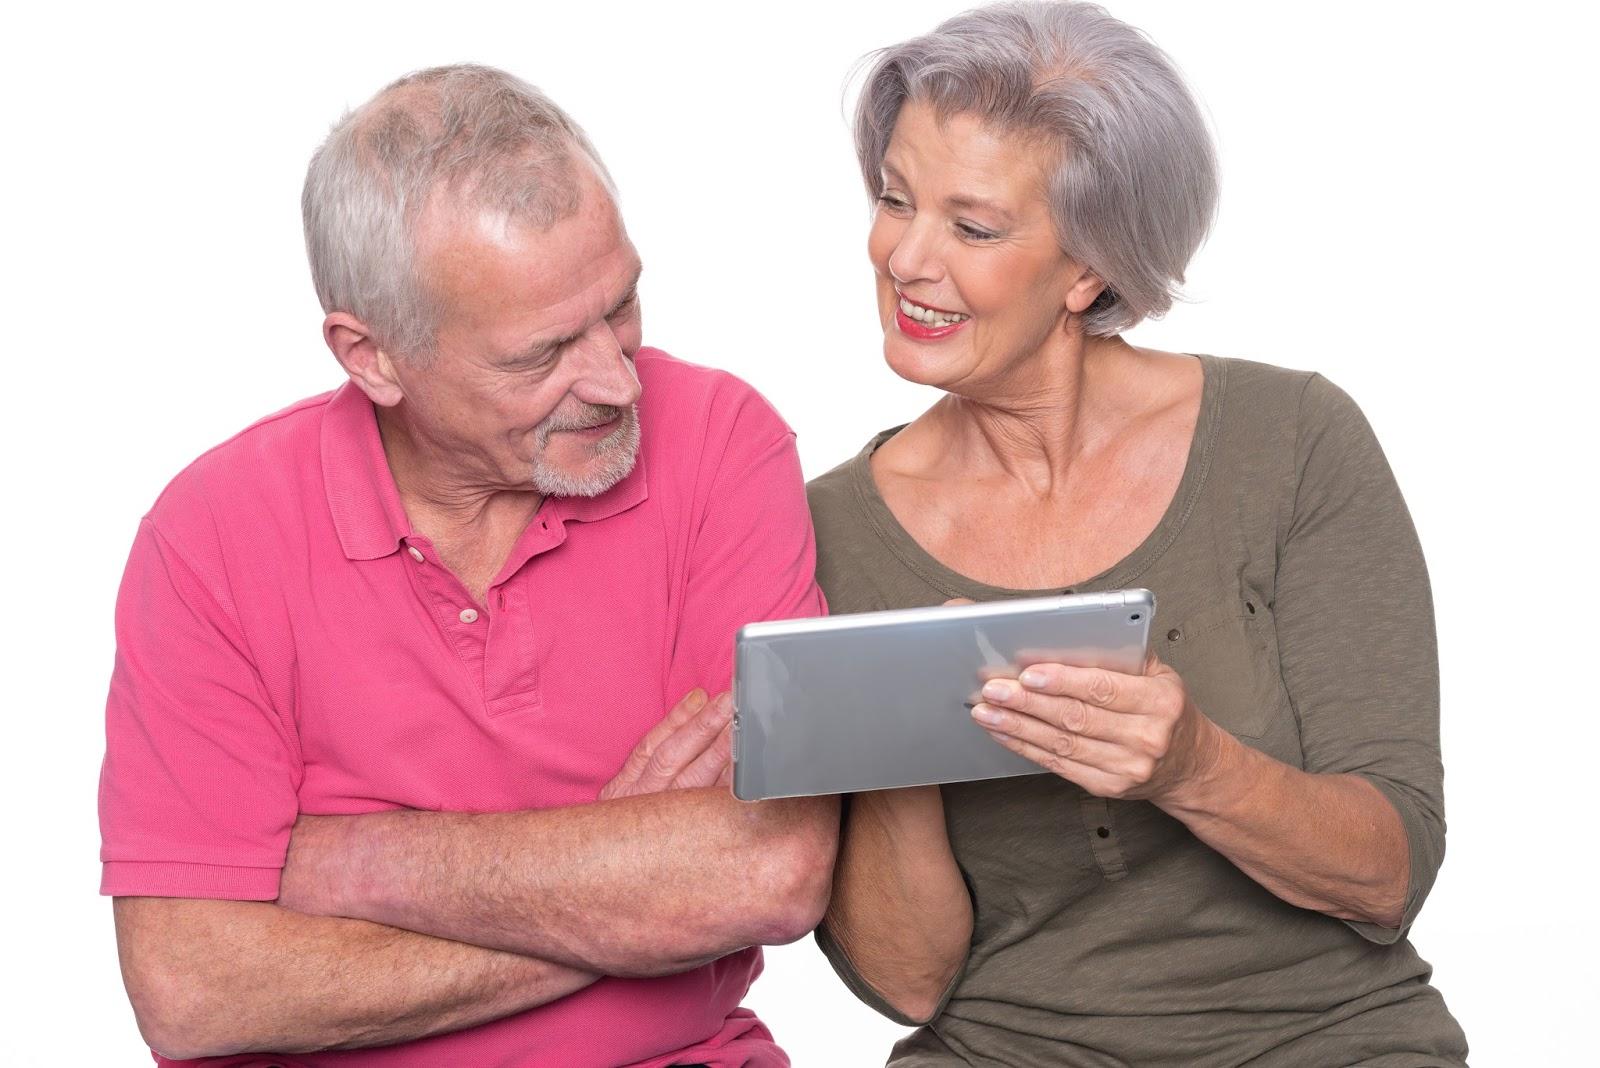 Austin Interracial Senior Singles Dating Online Site